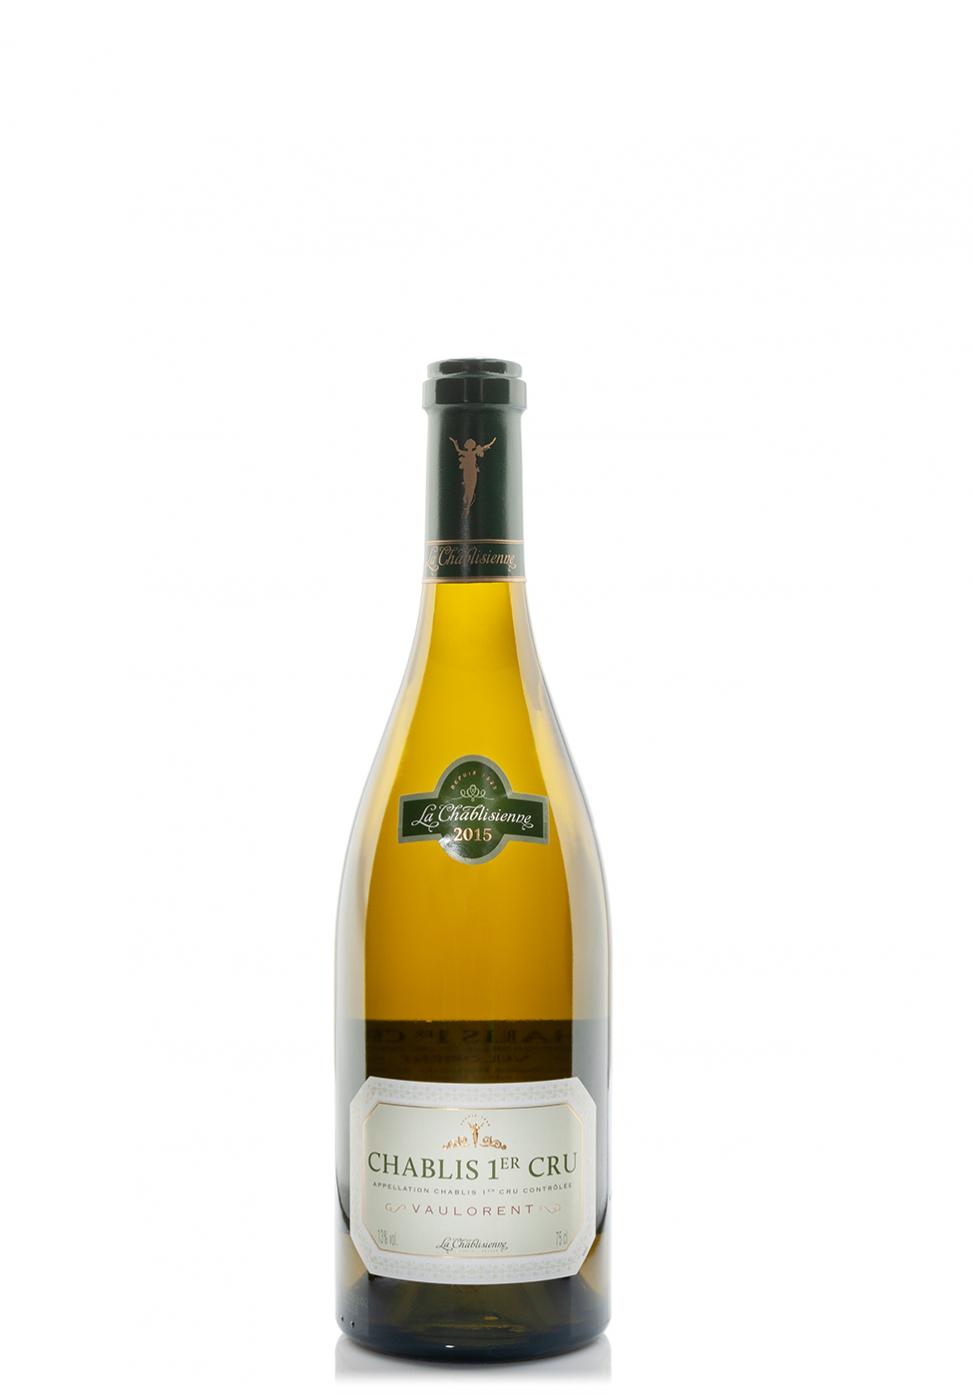 Vin Chablis 1er Cru Vaulorent 2015 (0.75L)